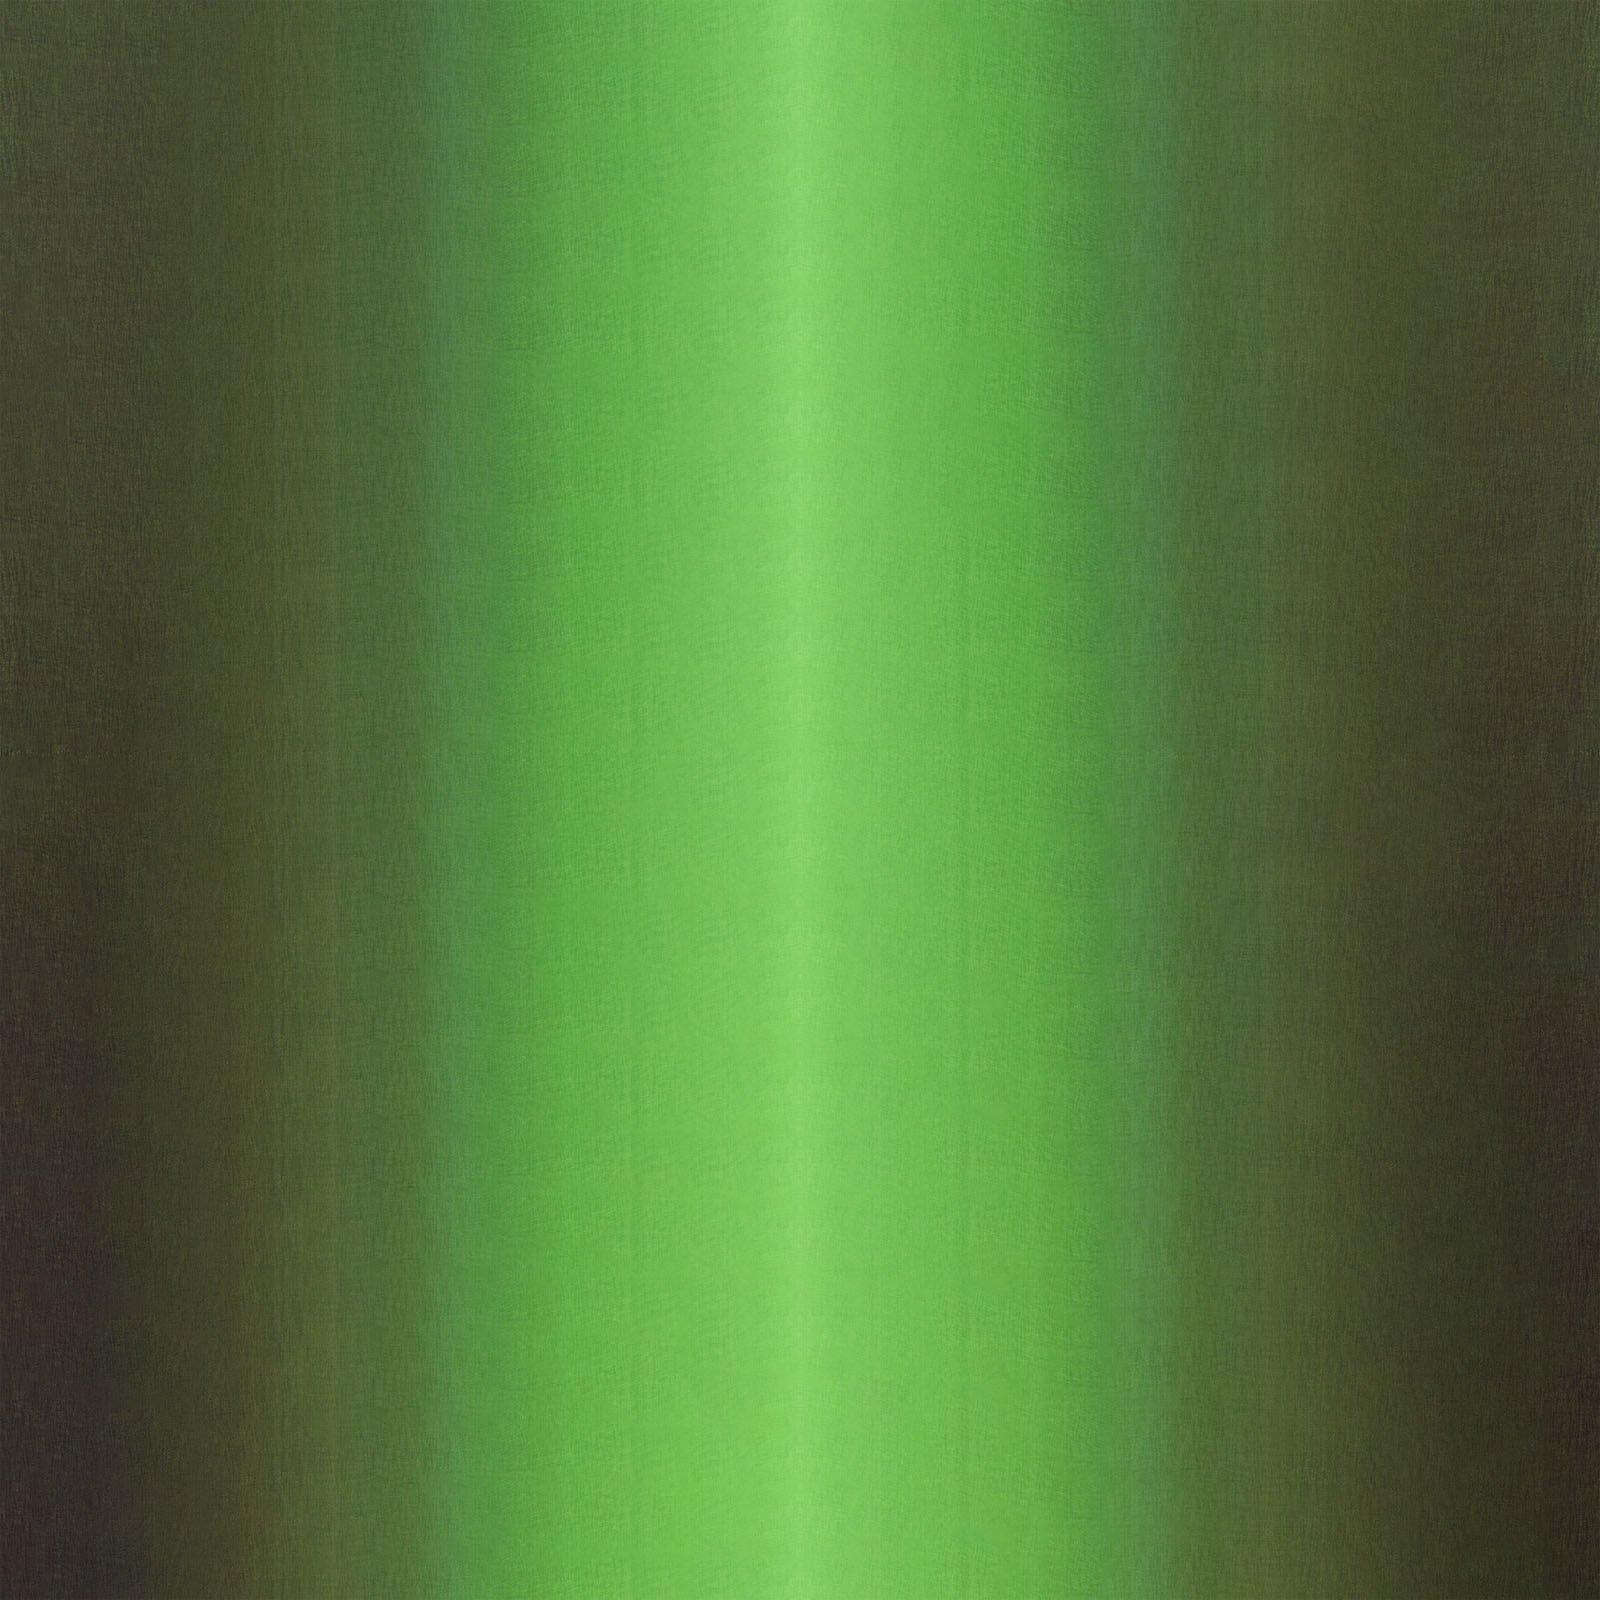 EESC-11216 G2 - GELATO OMBRE BY MAYWOOD GREEN TONAL